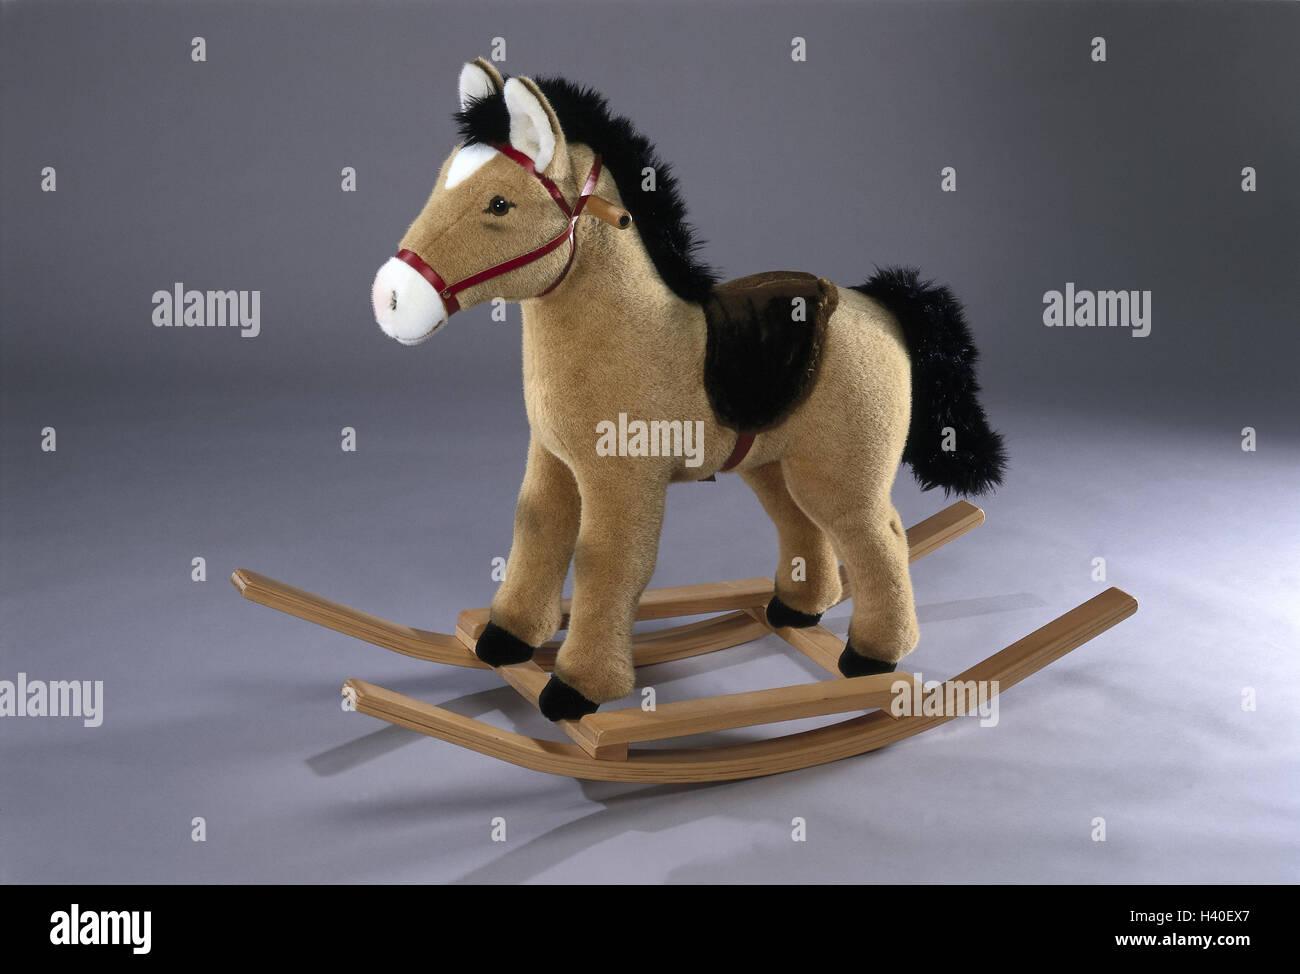 Rocking Horse Still Life Product Photography Toys Toys Horse Stock Photo Alamy